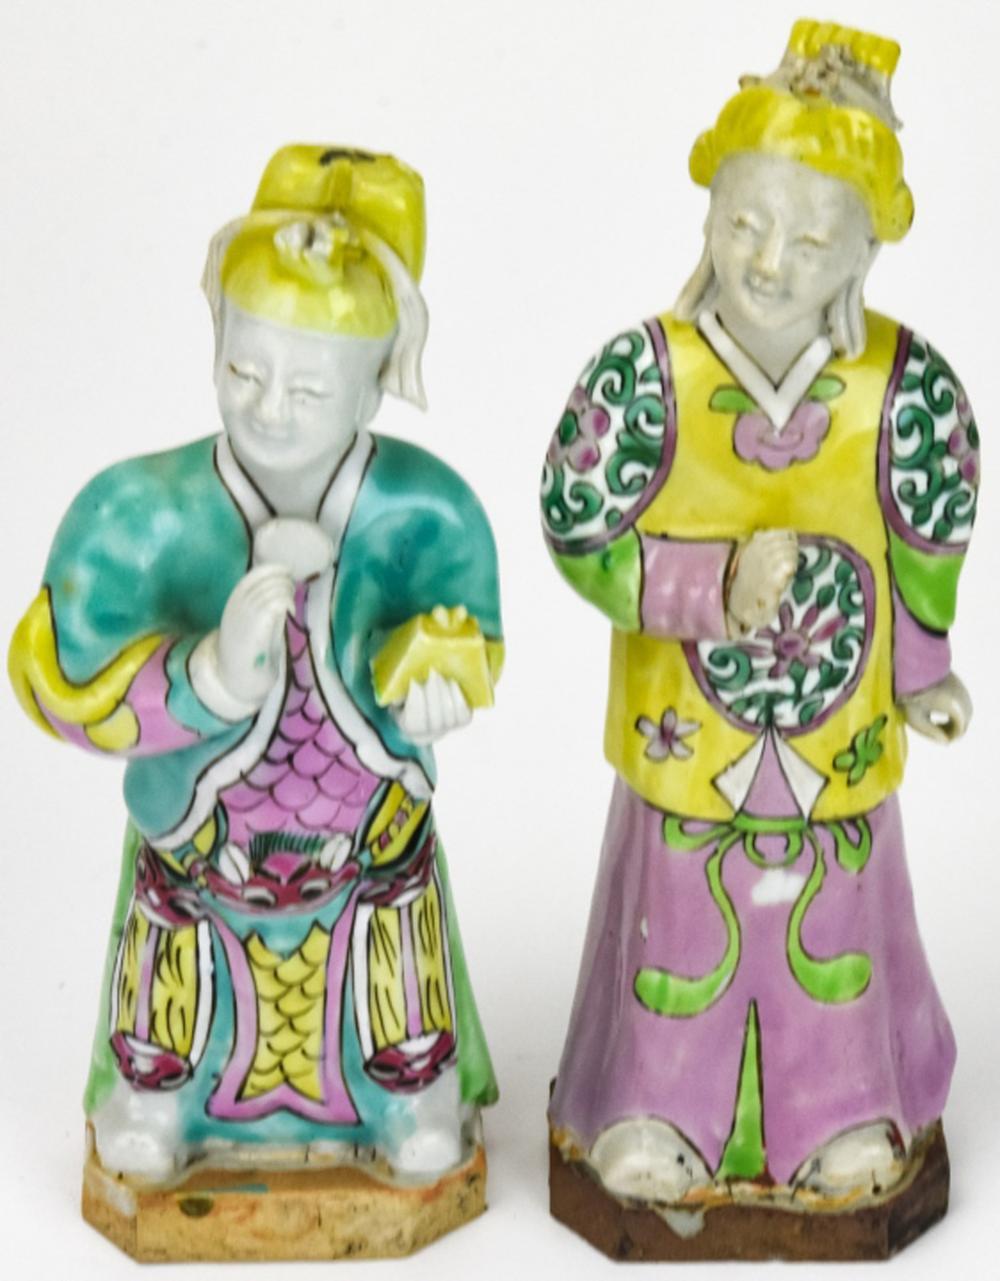 Pair of Antique 18th Century Chinese Figurines